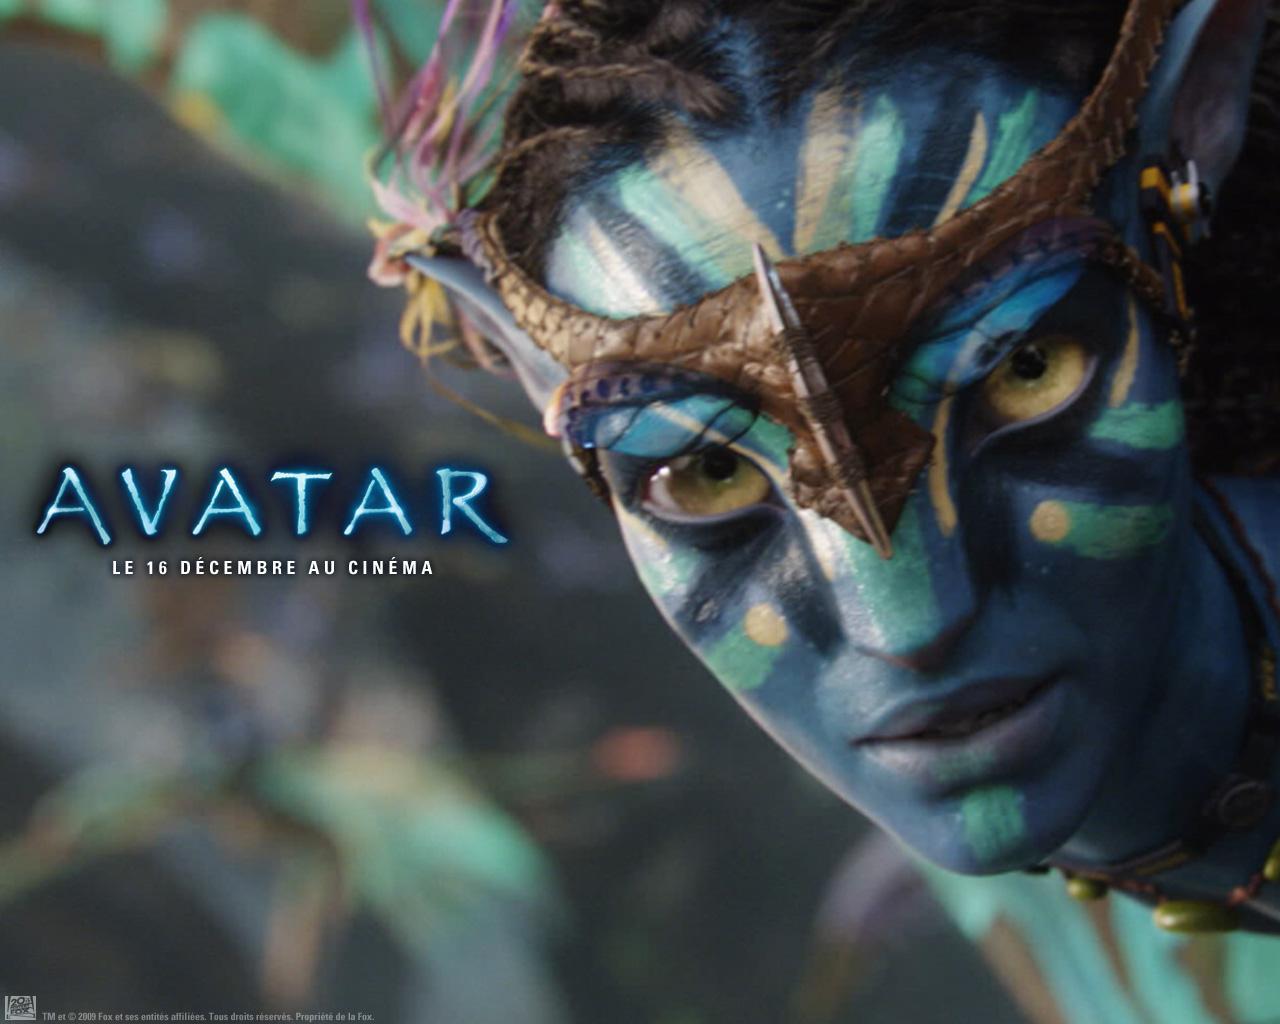 Wallpaper AVATAR Habitante avatar de Pandora